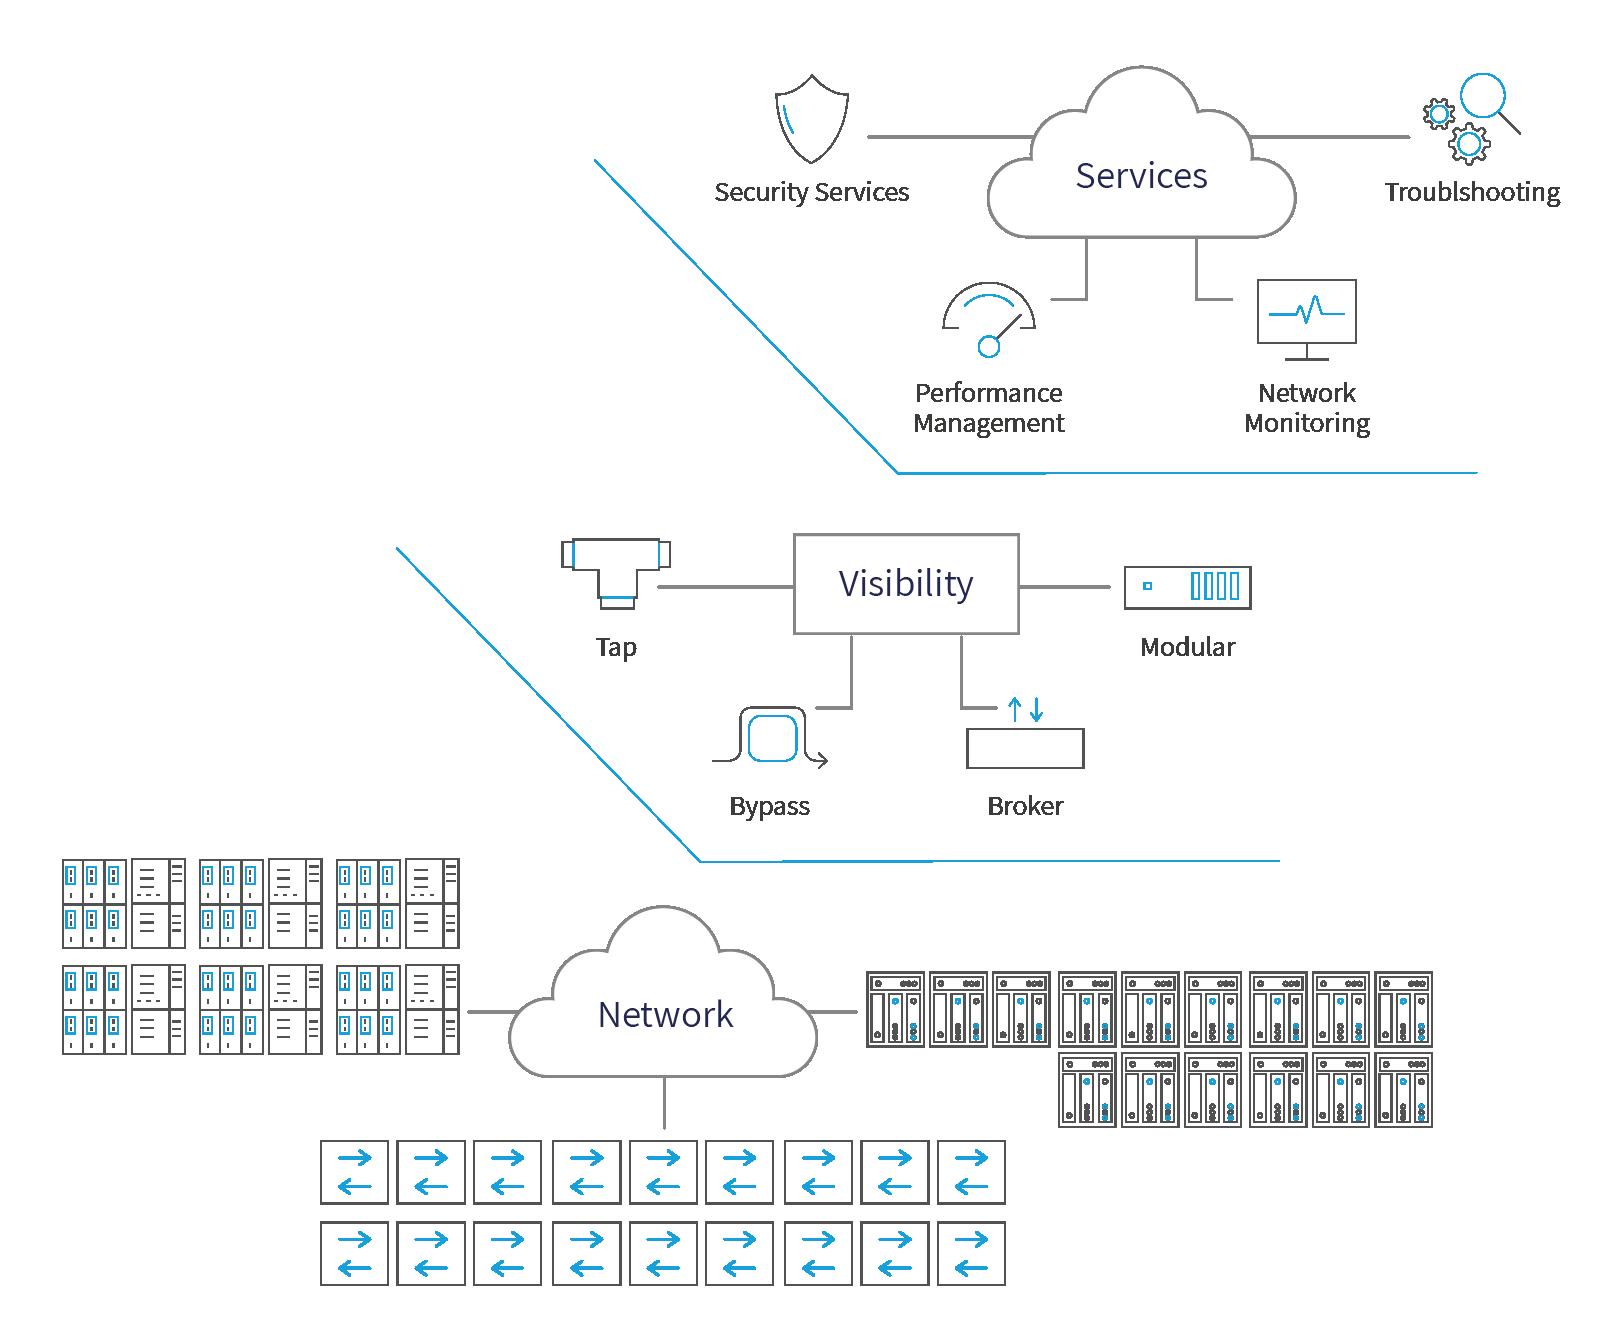 Niagara's network monitoring tools cut operating costs and improve ROI.